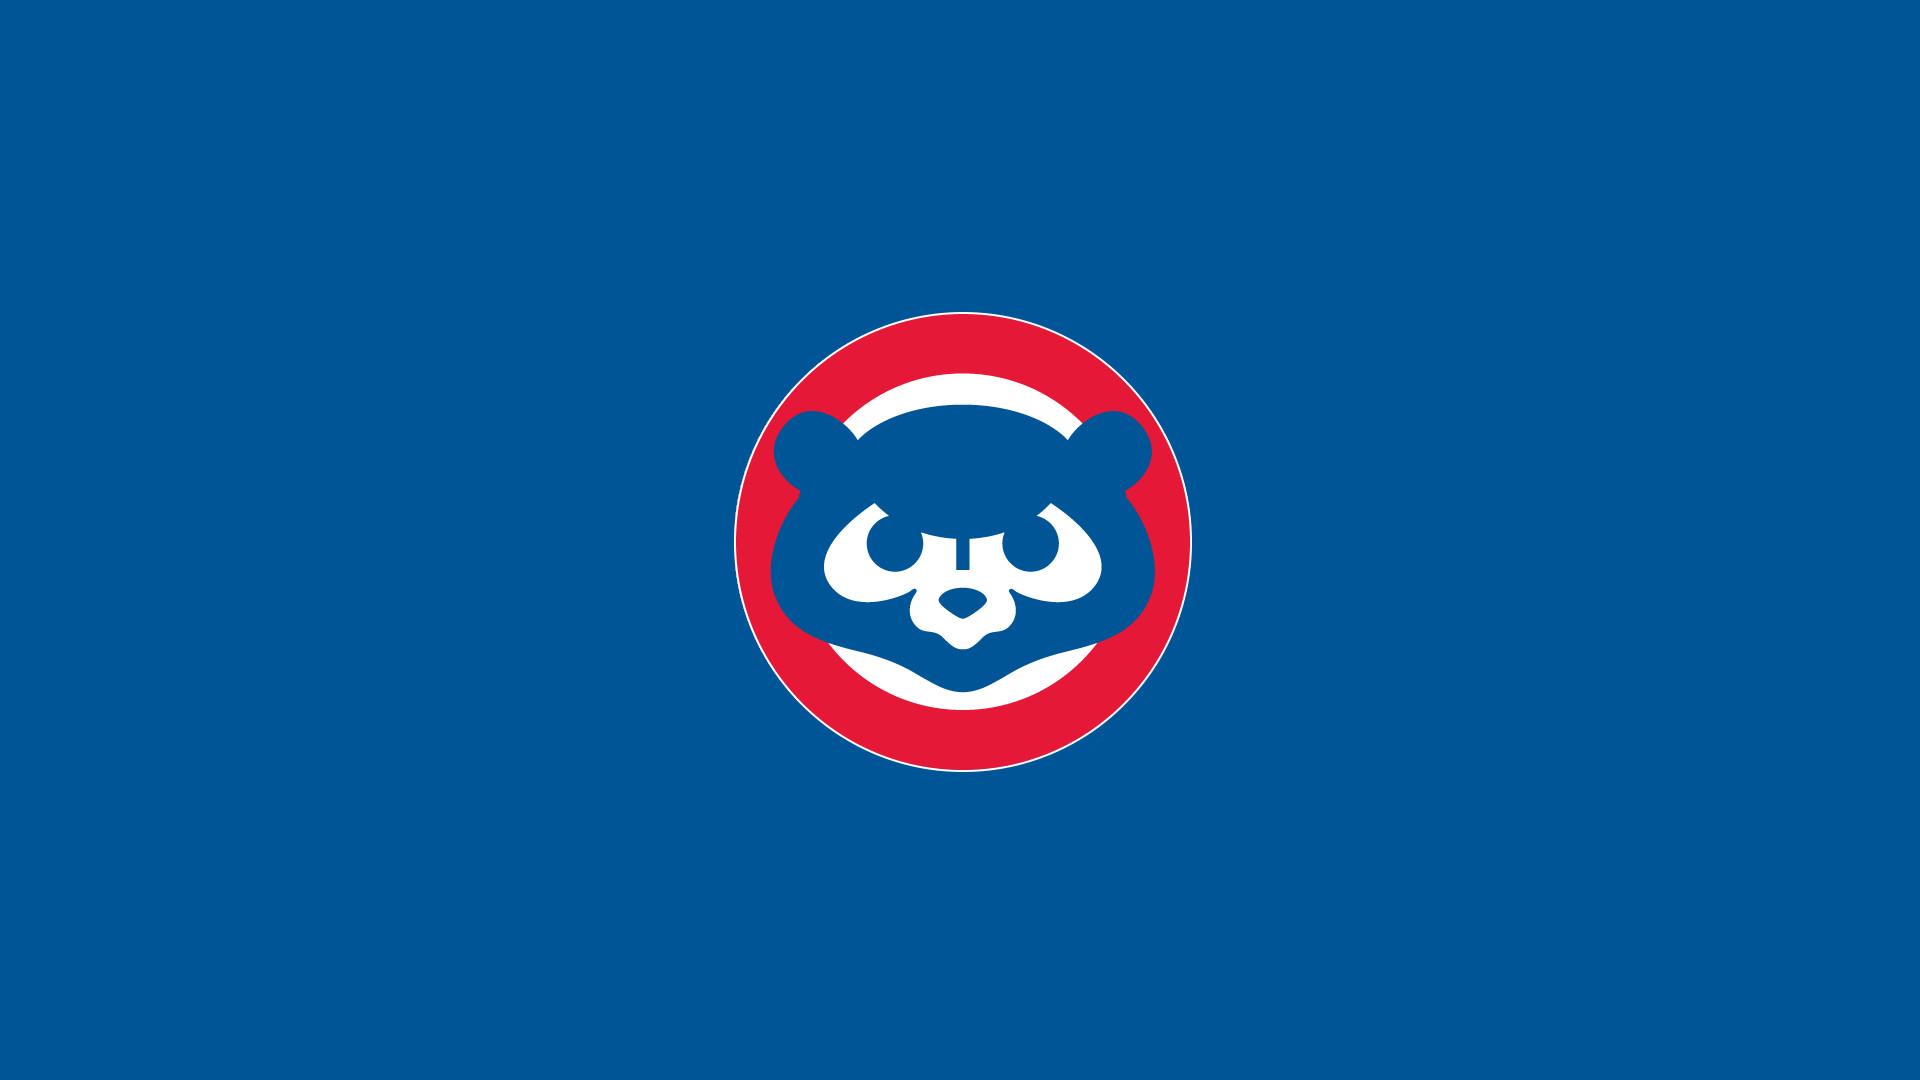 Best 20+ Cubs wallpaper ideas on Pinterest | Chicago cubs wallpaper, Did  the cubs win and Chicago cubs mlb